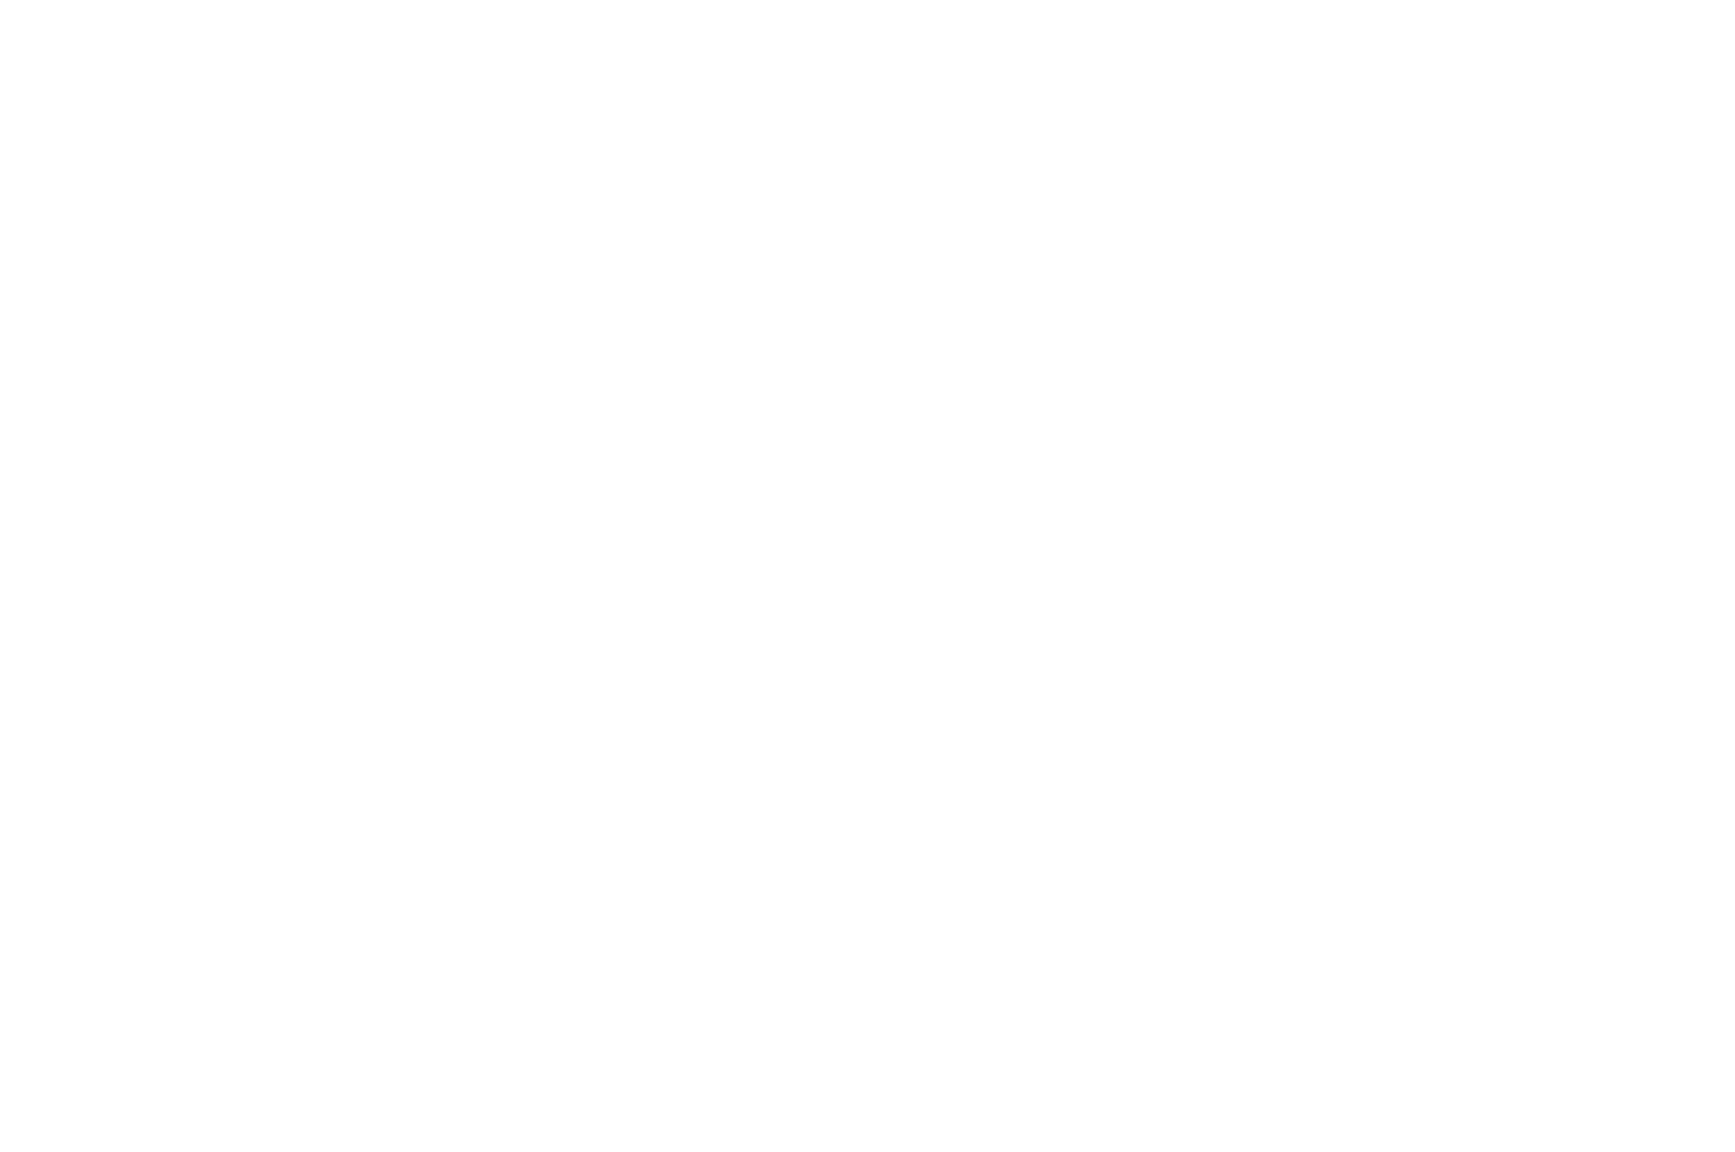 Queergestreift Filmfestival - 2019.png